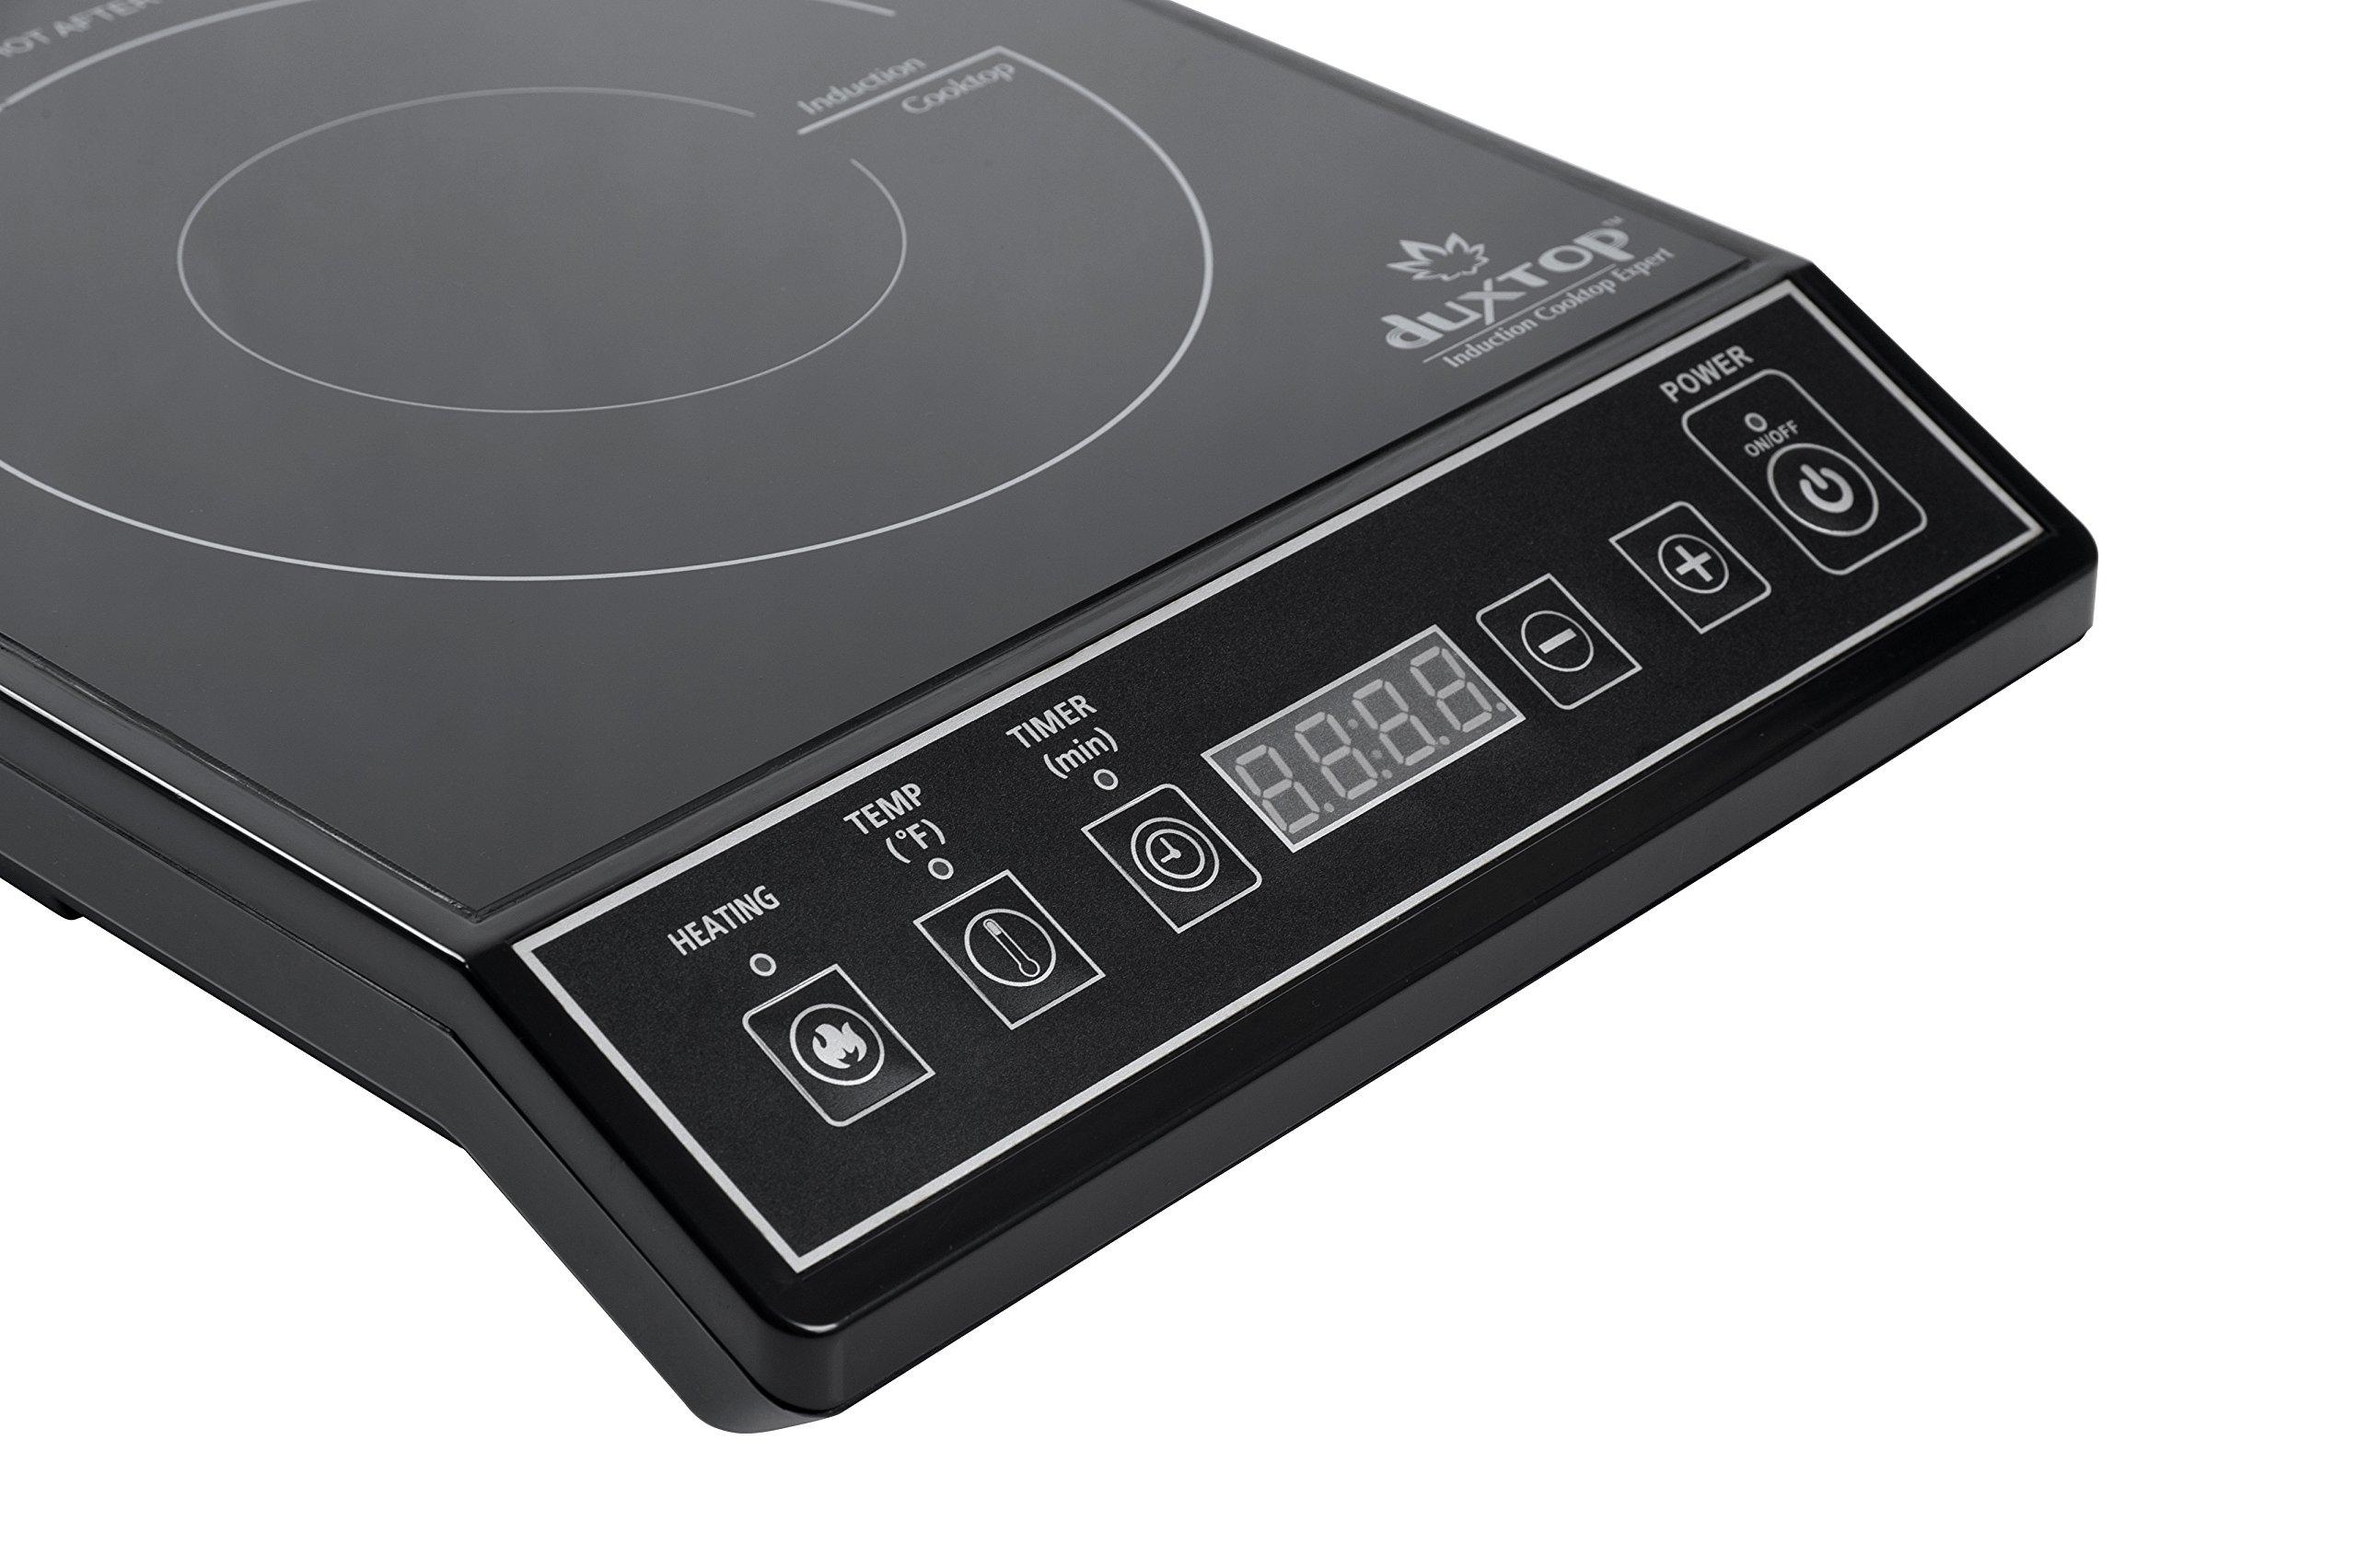 Secura 9100MC 1800W Portable Induction Cooktop Countertop Burner, Black by Secura (Image #3)